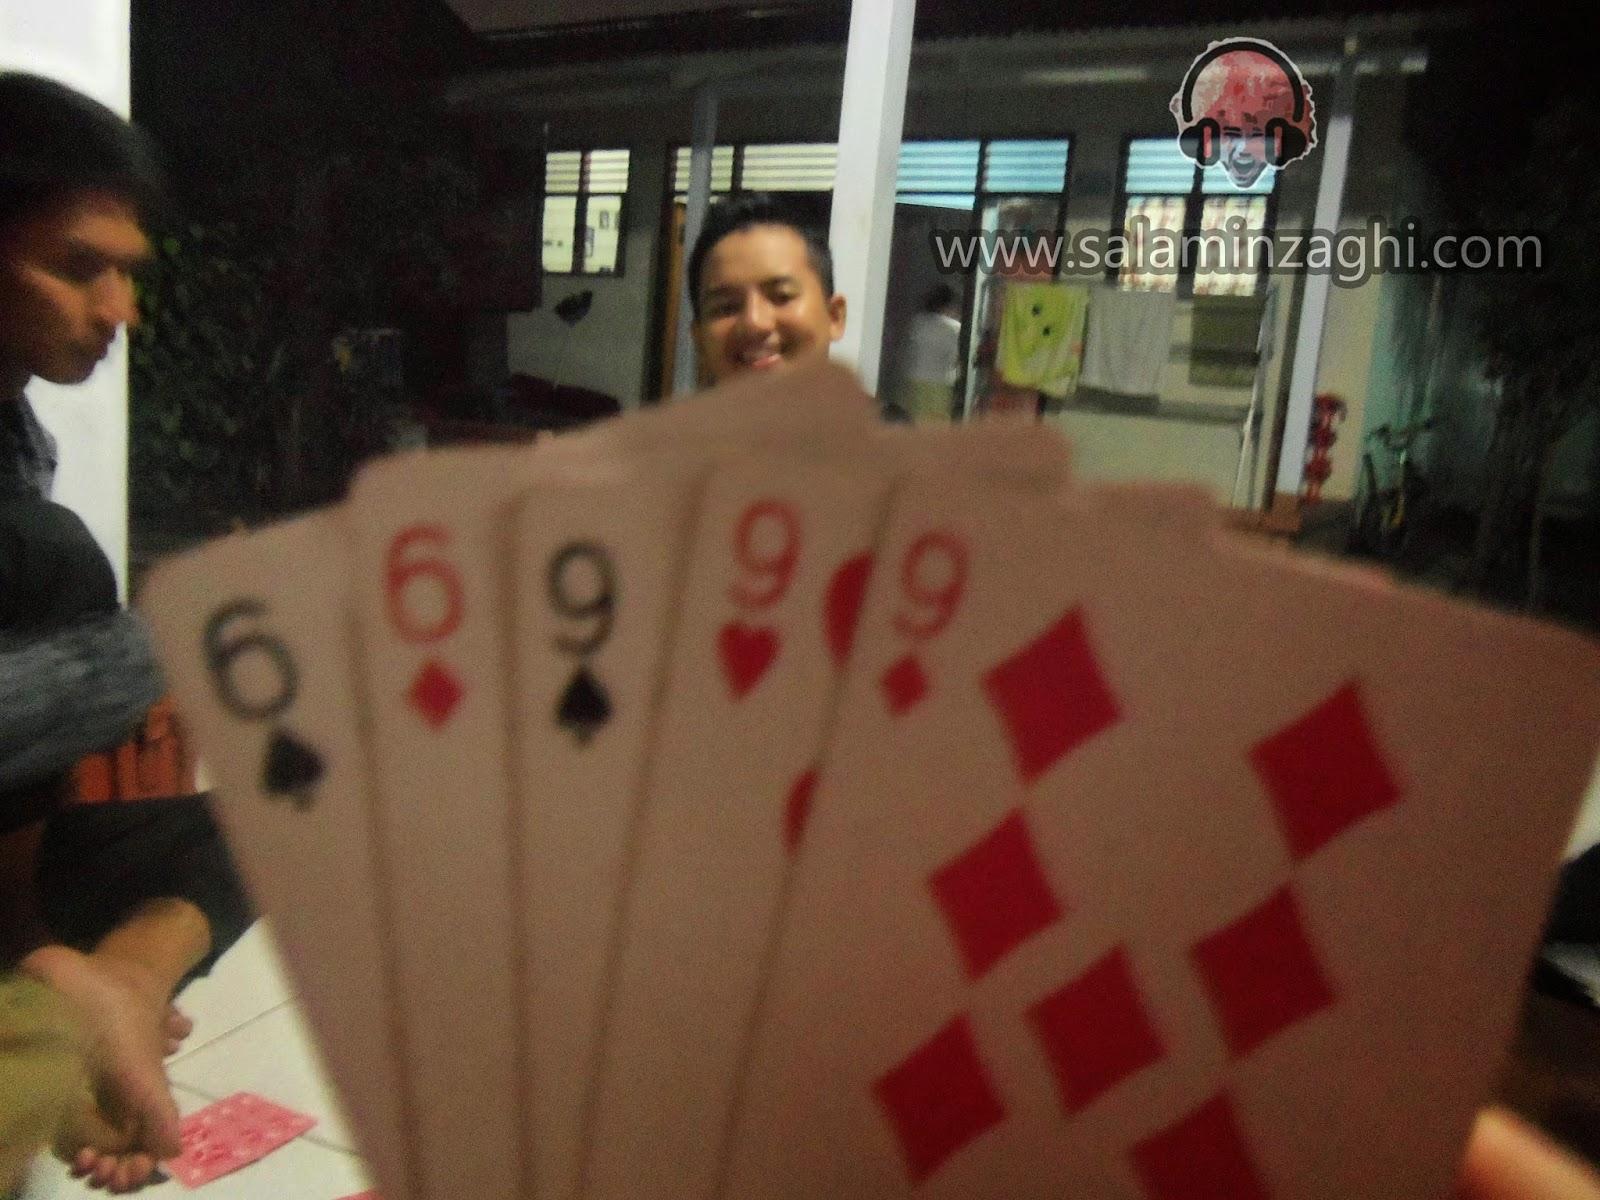 Texas Hold'em Poker, poker facebook, alumni smk muhammadiyah 3 tangsel, ramadhan, begadang, puasa, main kartu